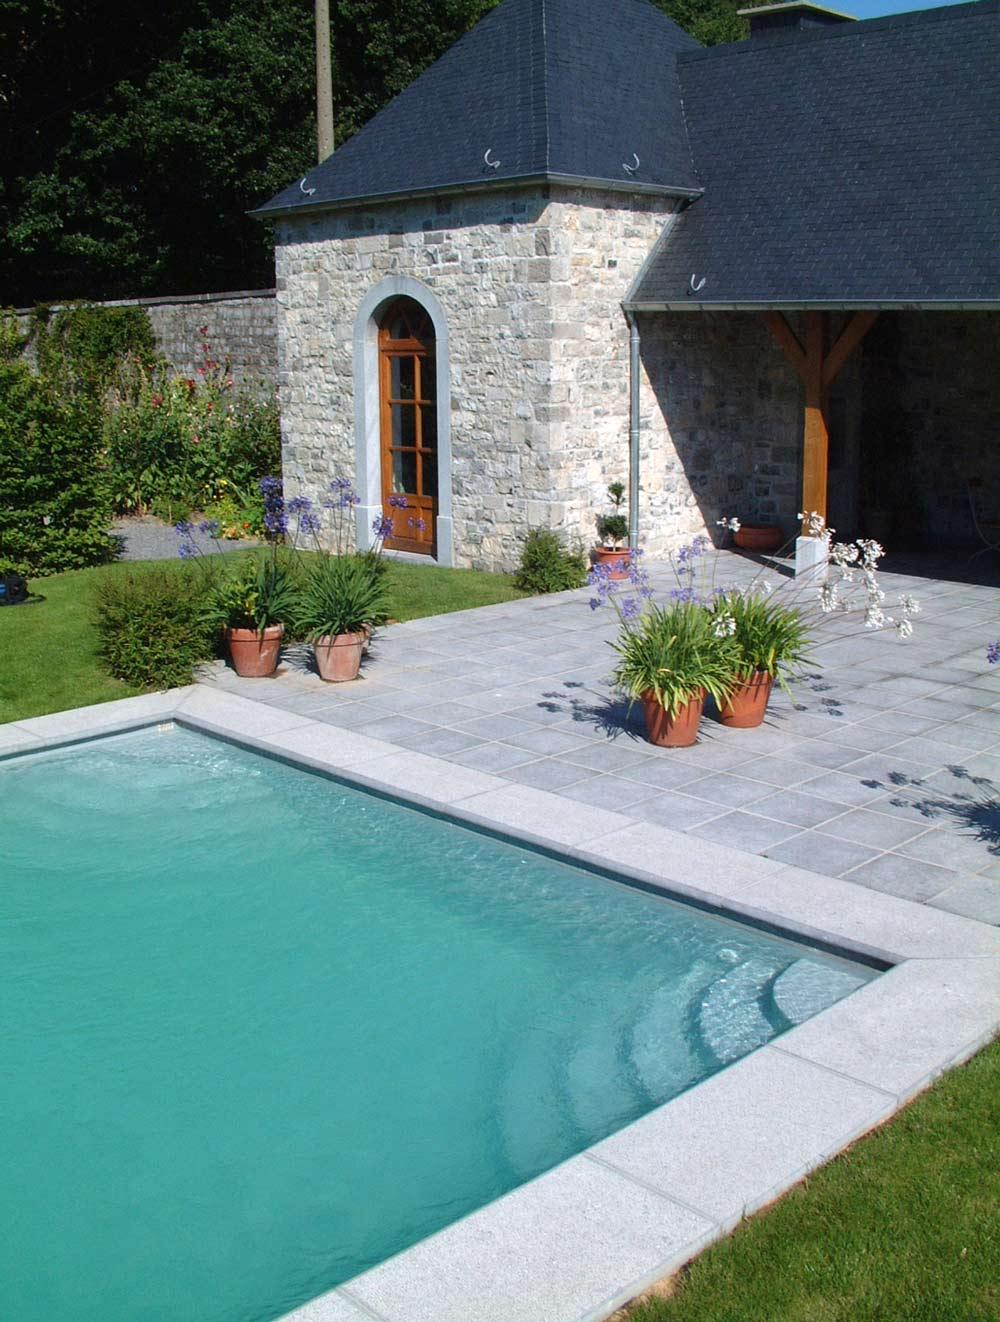 Margelle de piscine carri re briot saint servais namur for Margelle carrelage piscine